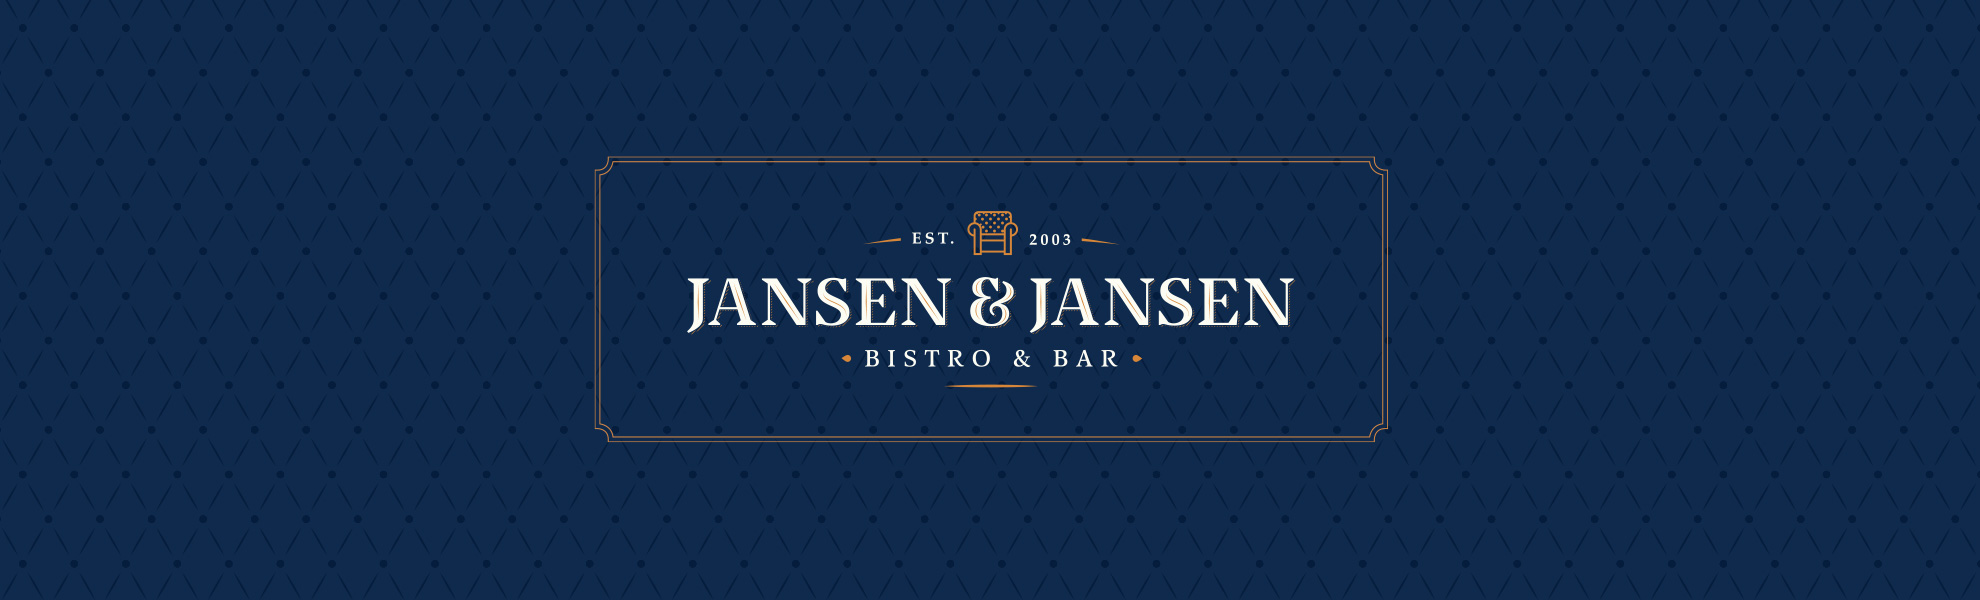 Jansen & Jansen logo